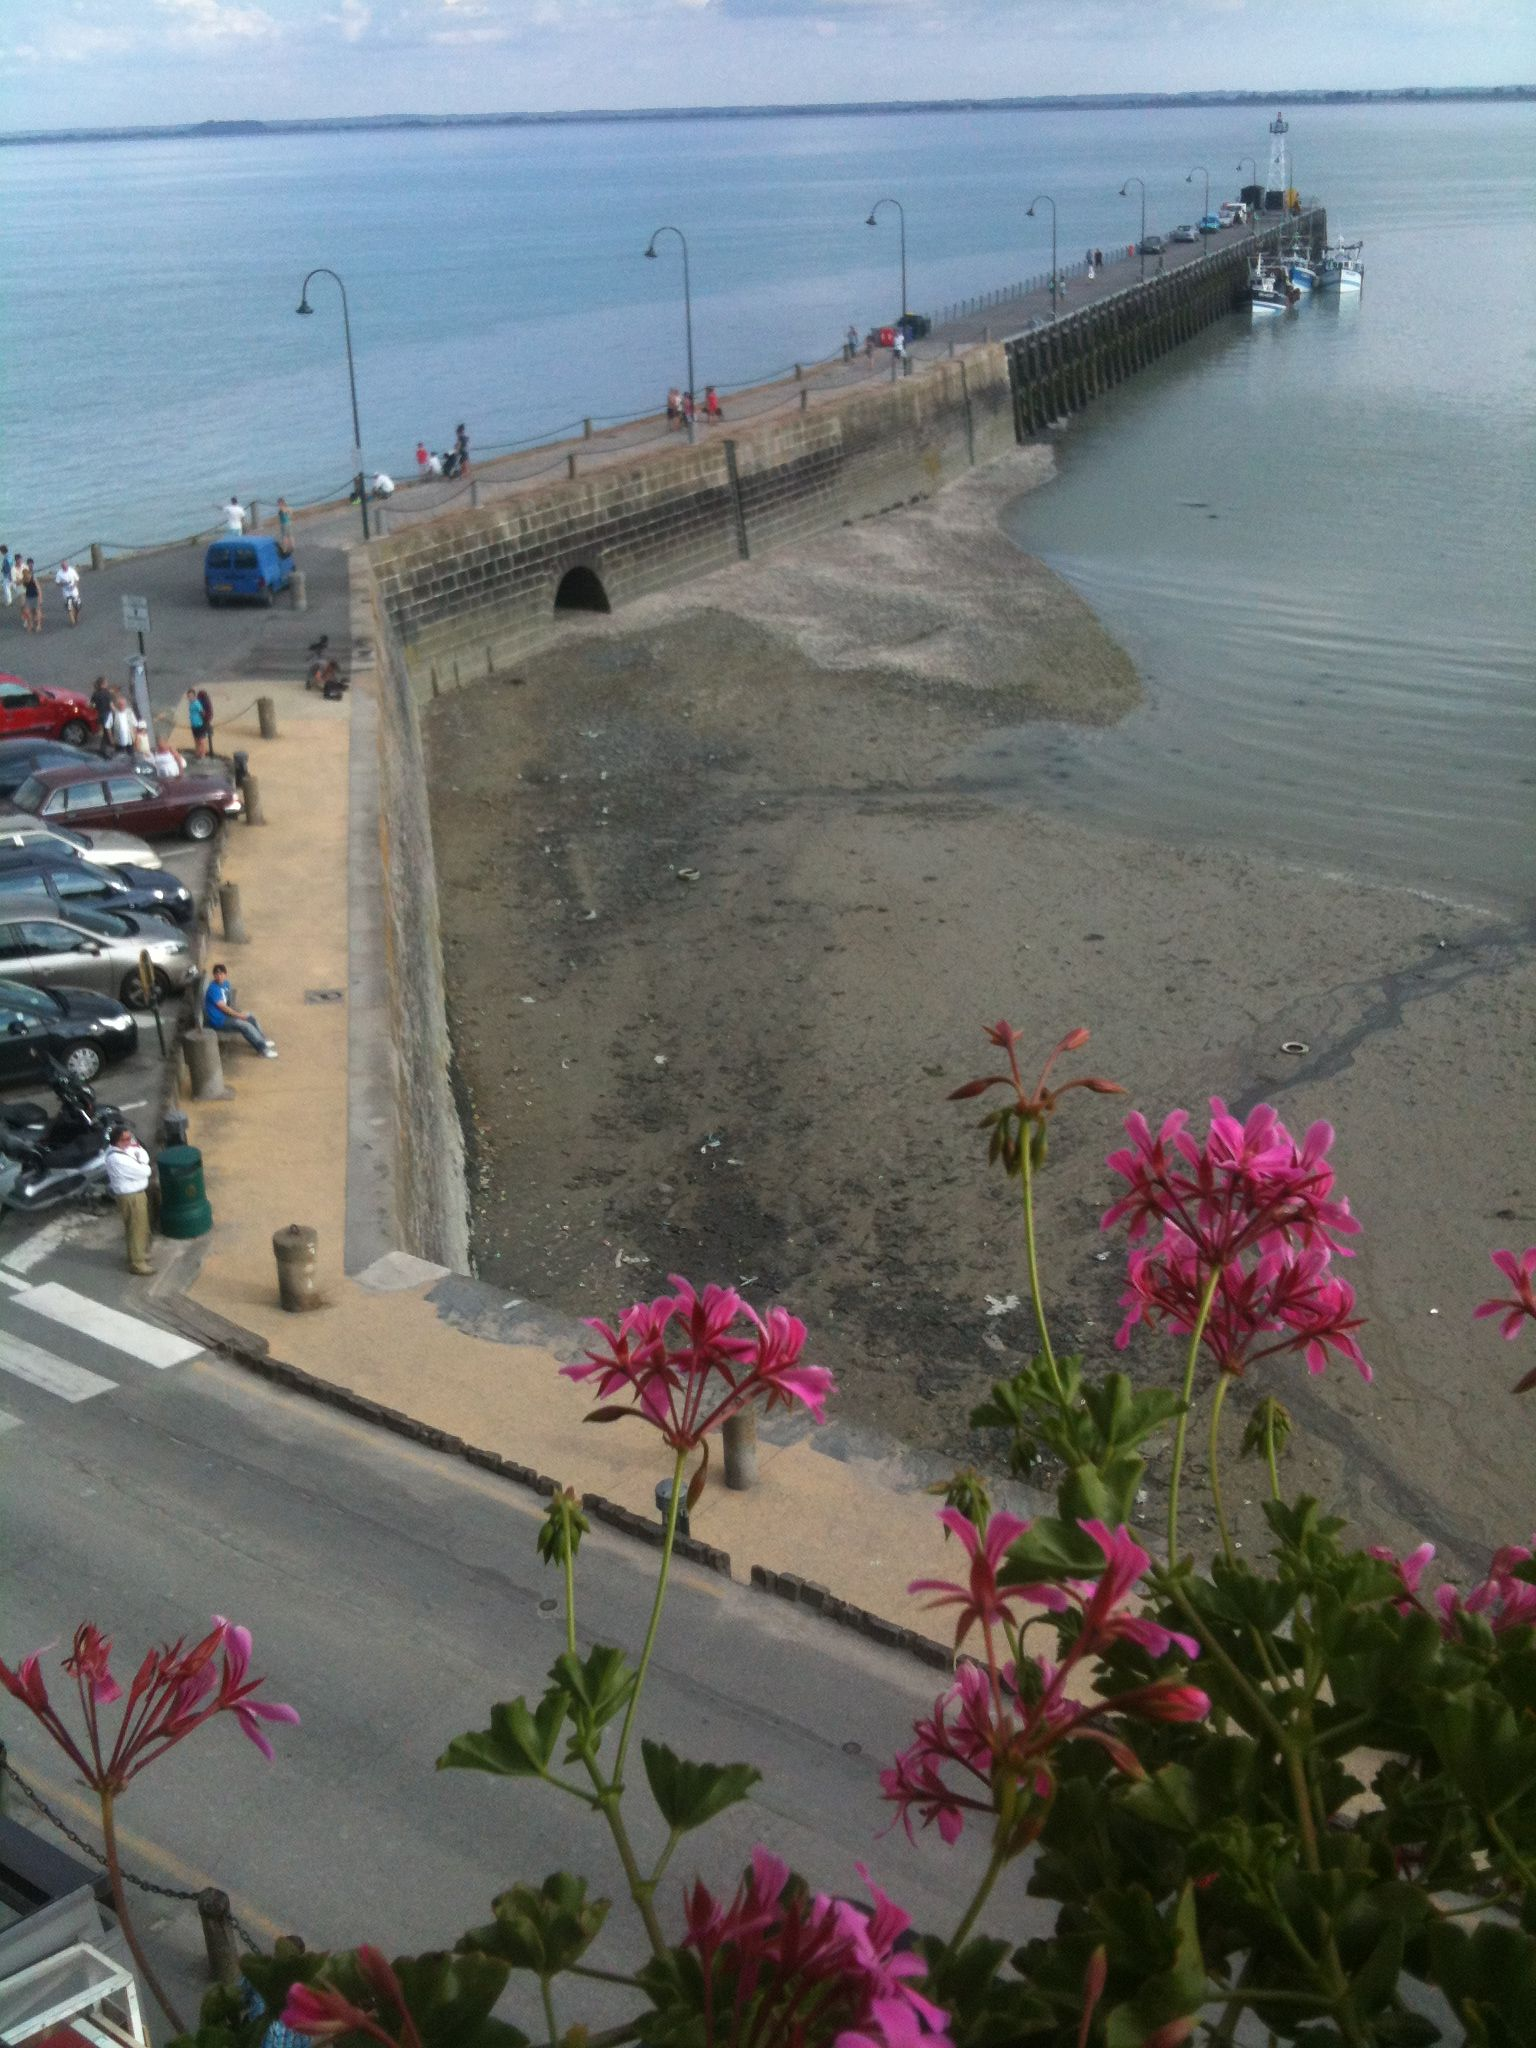 Cancale France has a seaside port area